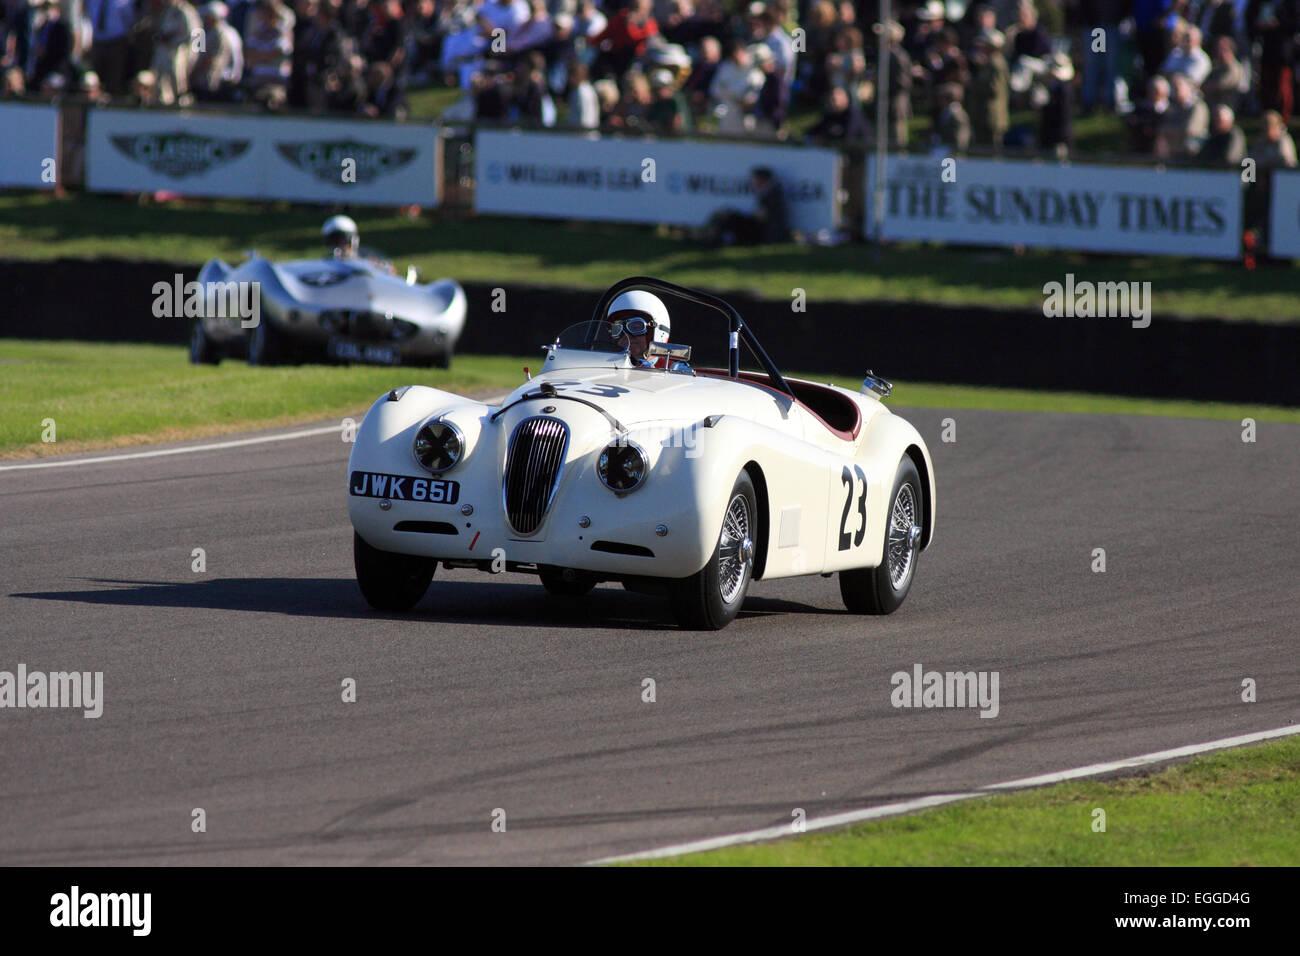 1950 Jaguar XK120 angetrieben von Stephen Bond aus Madgwick Ecke / Goodwood Revival / Goodwood / UK Stockbild